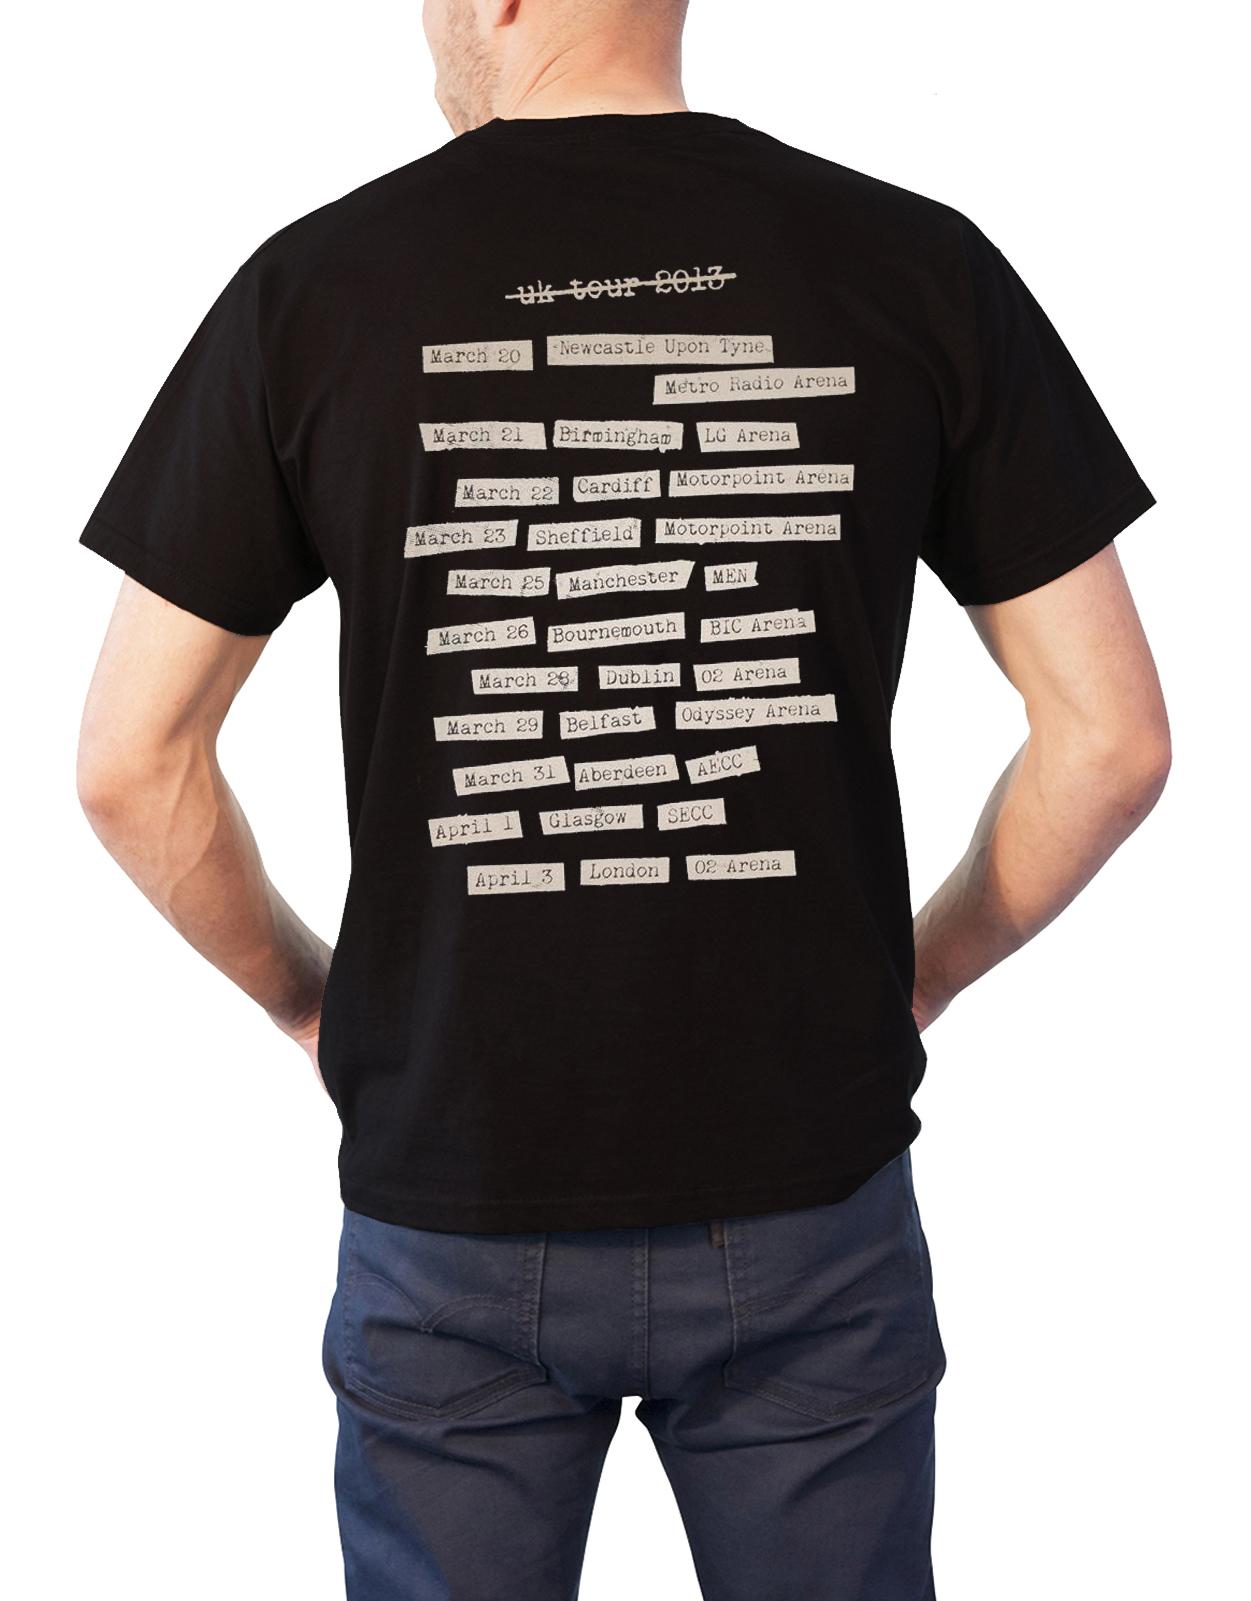 Biffy clyro t shirt ellipsis band logo tour opposites for Band t shirts for men